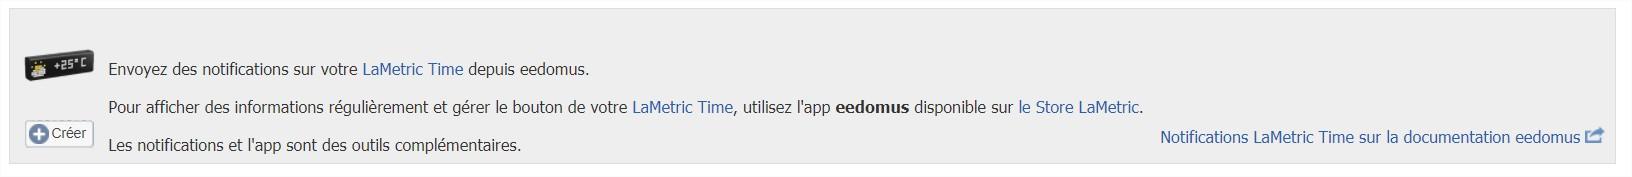 lametric-time-eedomus-domolab